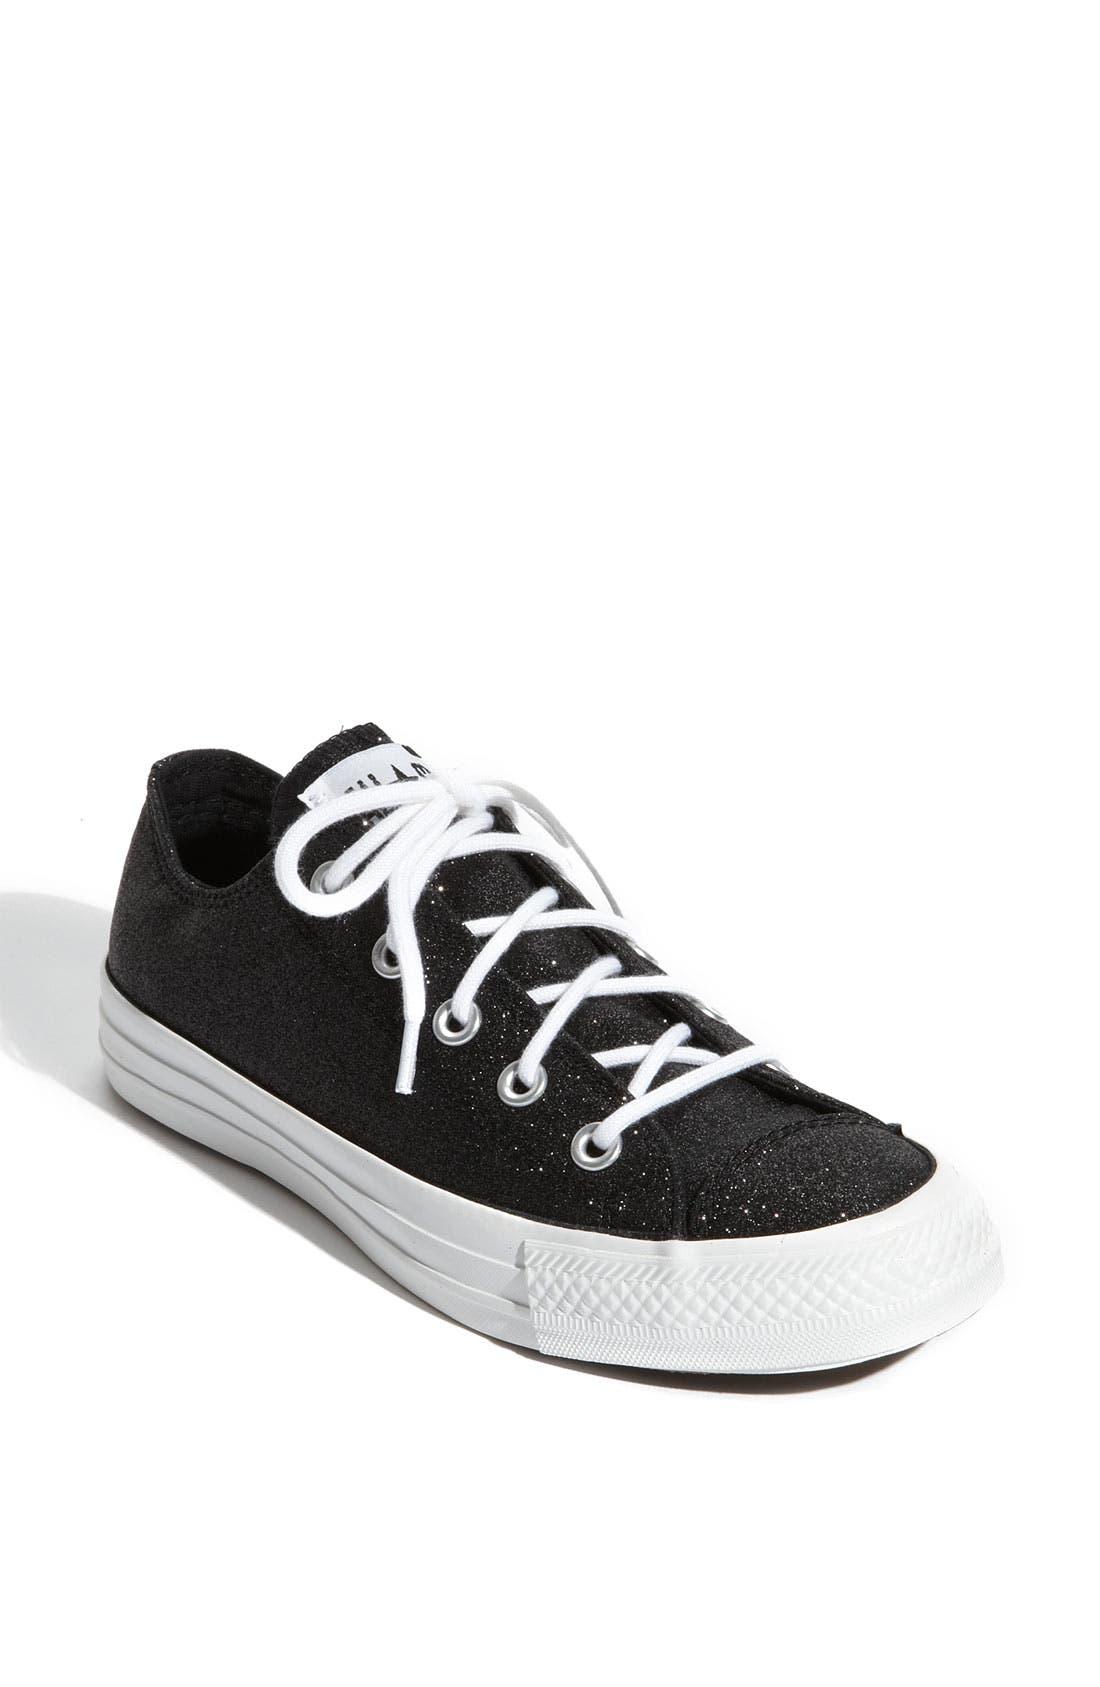 Alternate Image 1 Selected - Converse Chuck Taylor® 'Winter Glitz' Sneaker